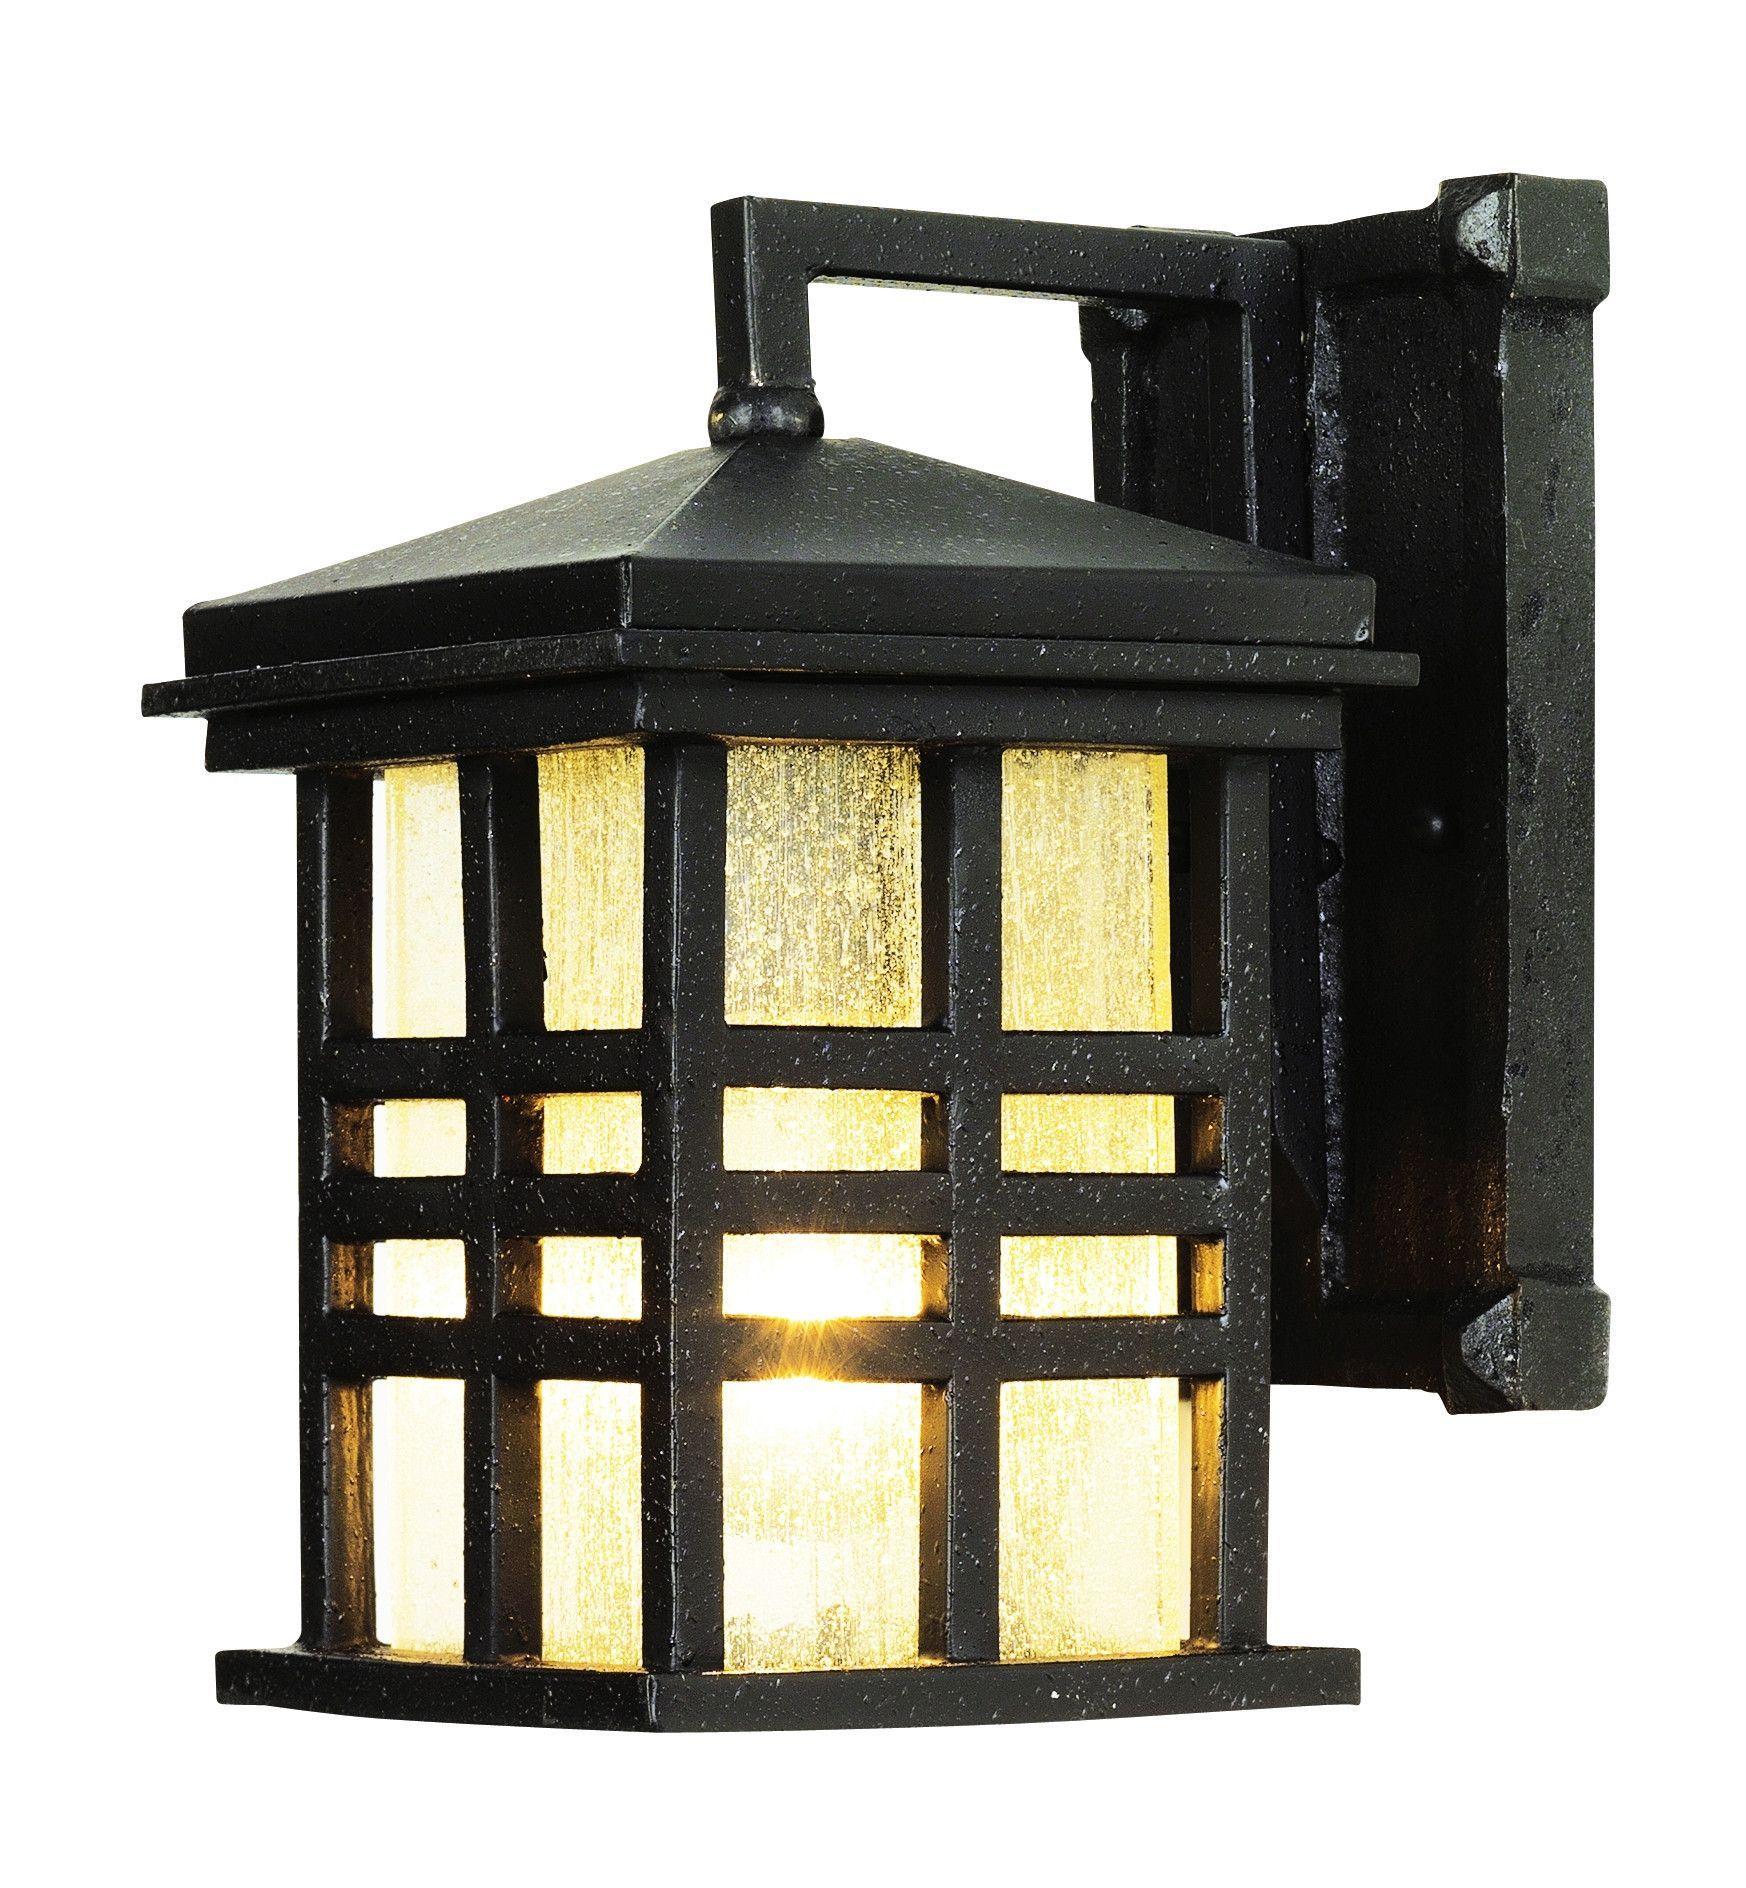 Trans Globe Lighting 4635 Bk Rustic Craftsman Coach Light Black Outdoor Wall Lantern Wall Lantern Outdoor Sconces